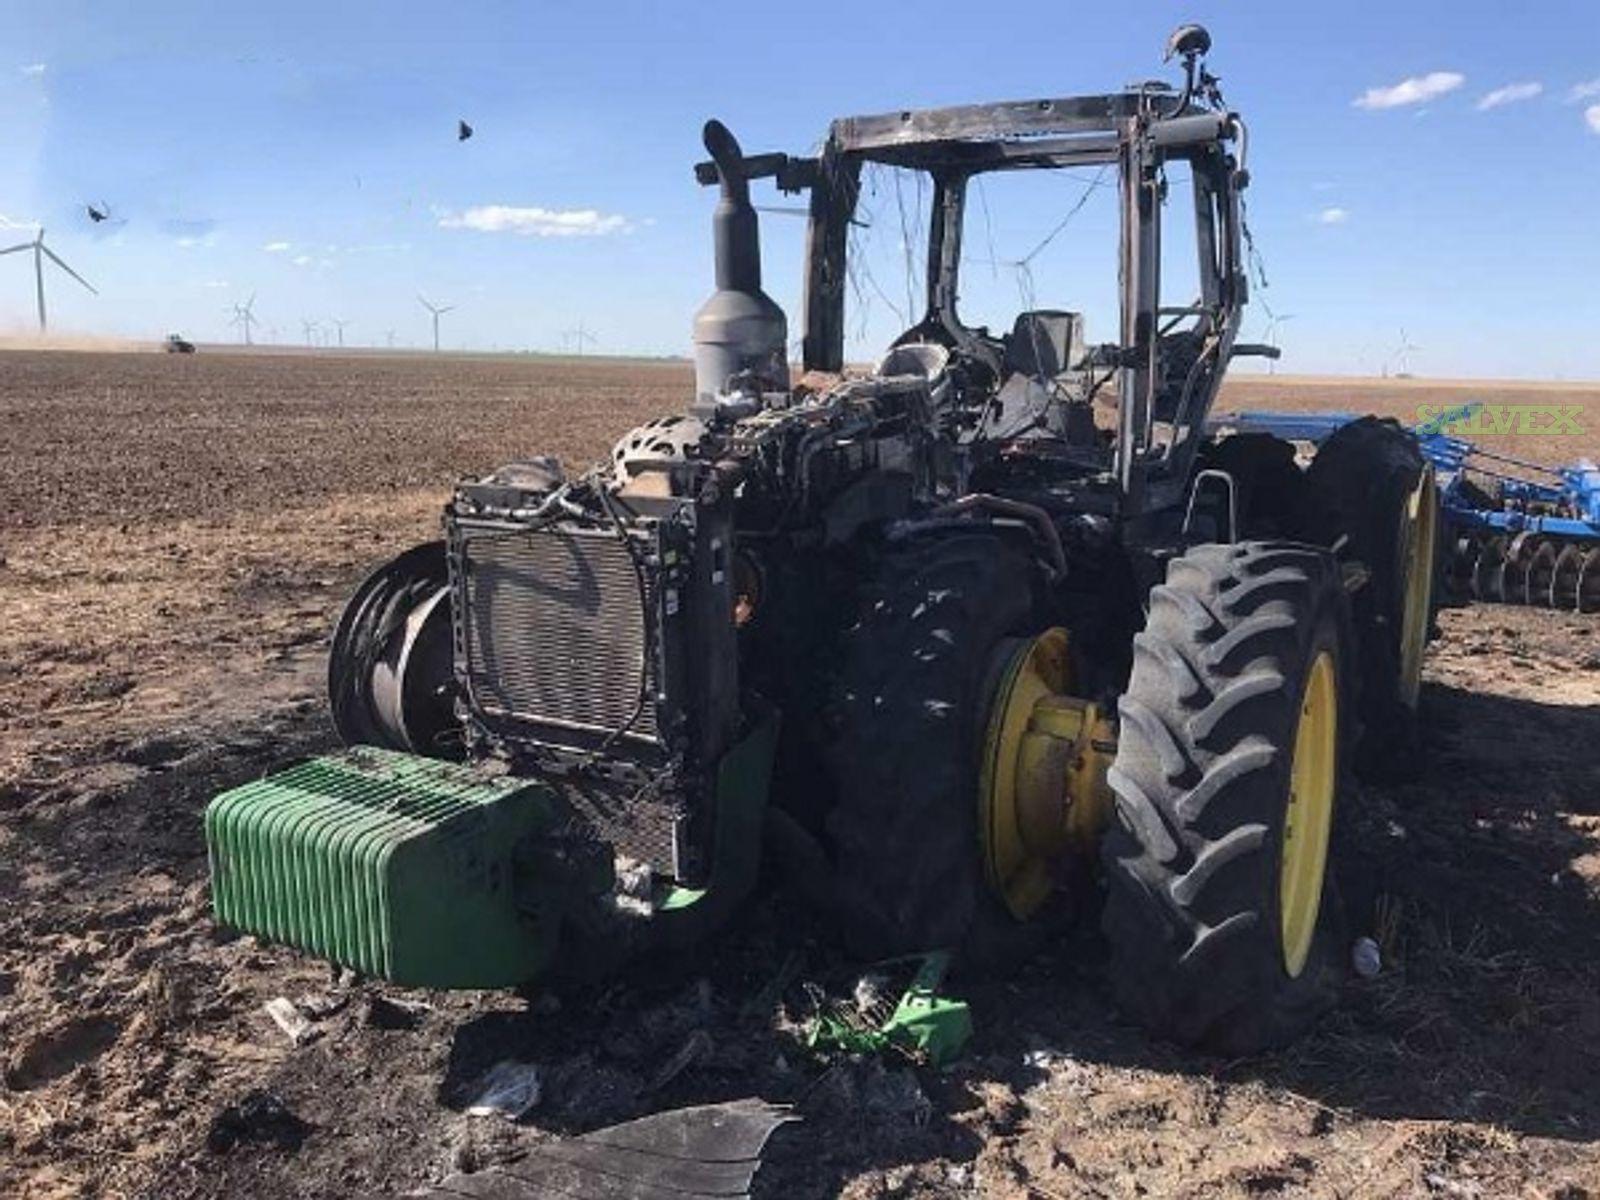 John Deere 8230R Tractor - Fire Damaged